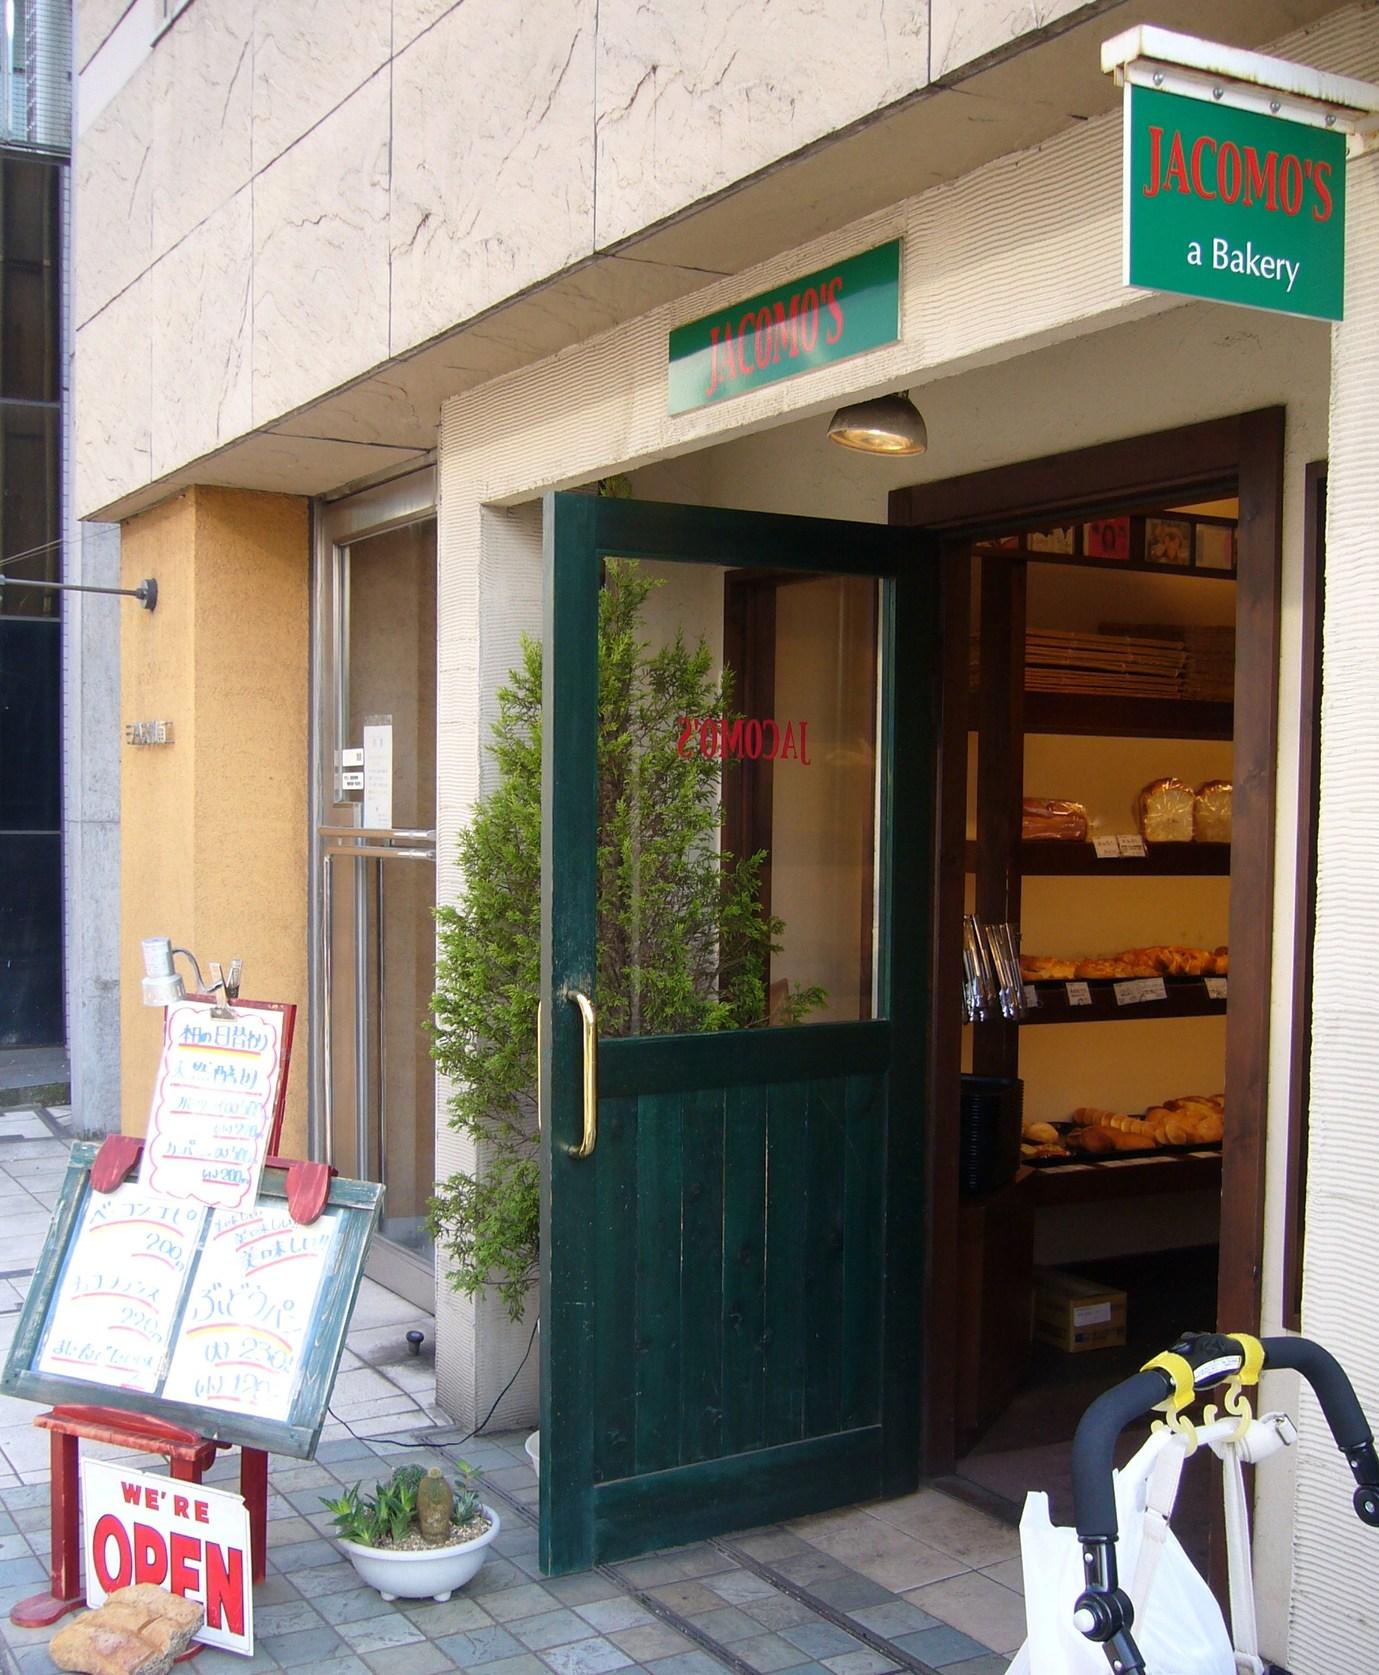 JACOMO'S a Bakery